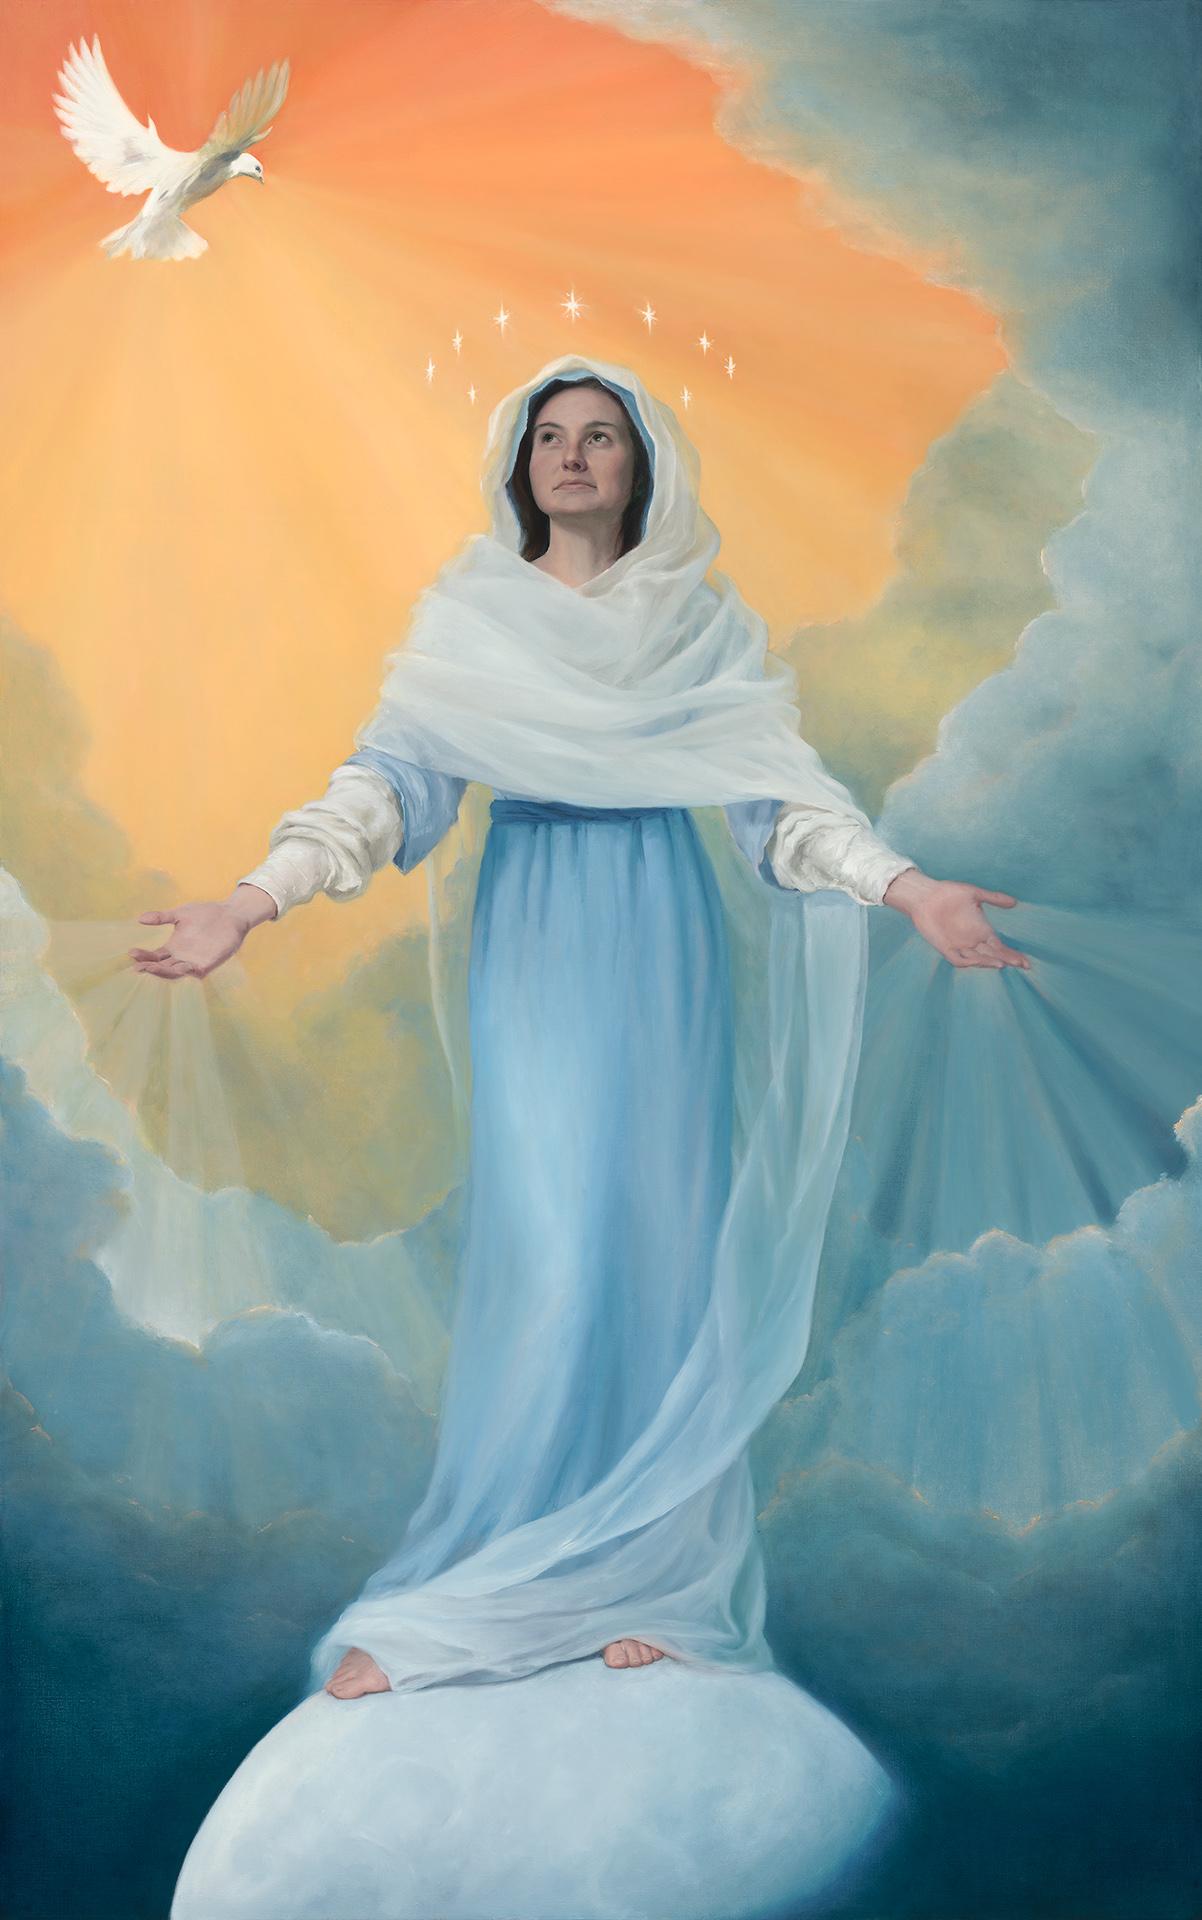 20284 Sheryl Moran - My soul magnifies the Lord WEB.jpg